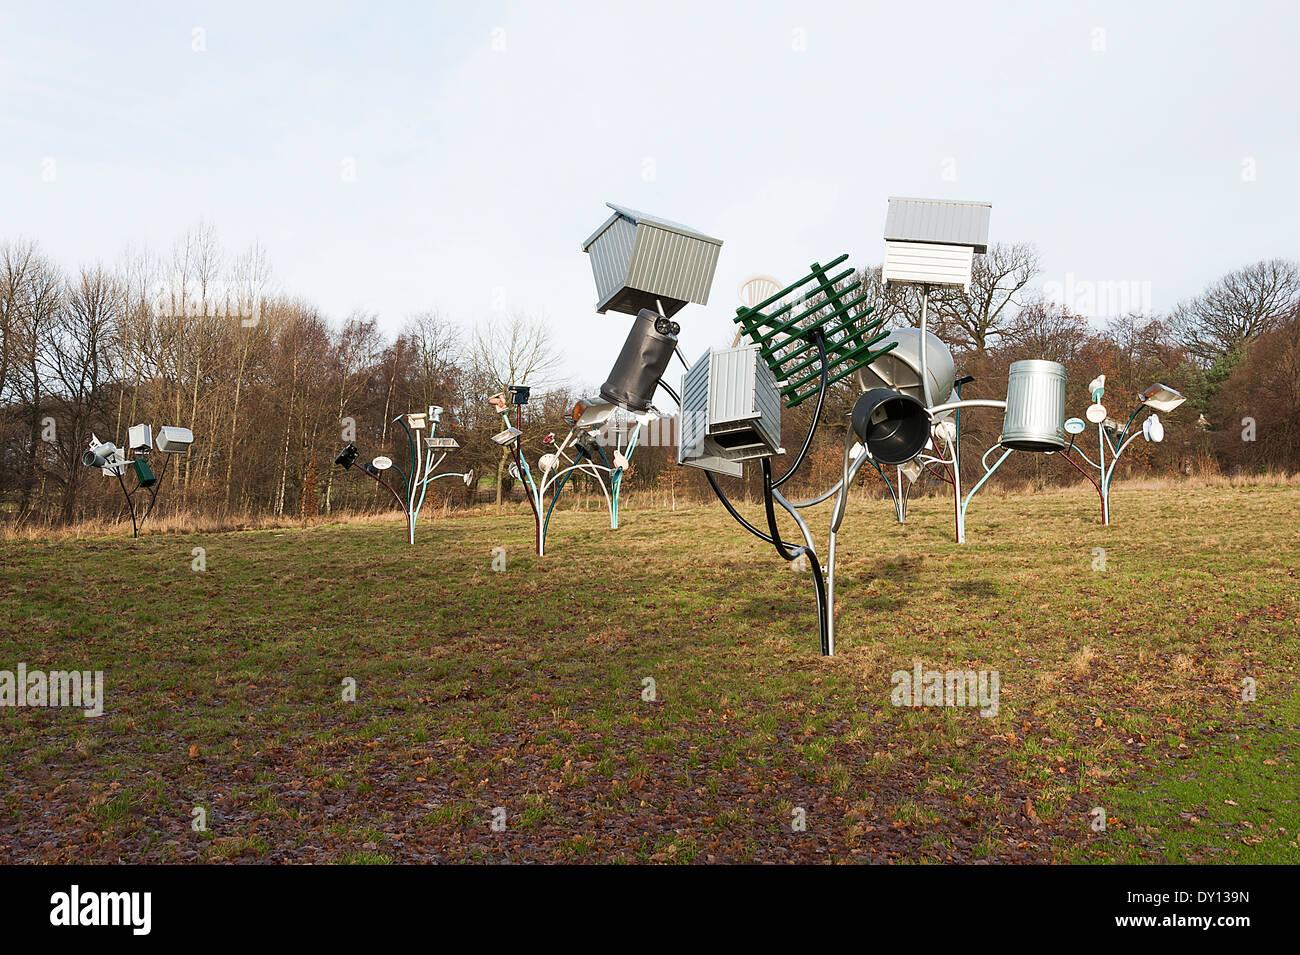 Bäume Alternative Landschaft Komponenten Skulpturen bei Yorkshire Sculpture Park West Bretton Wakefield England Vereinigtes Königreich UK Stockbild